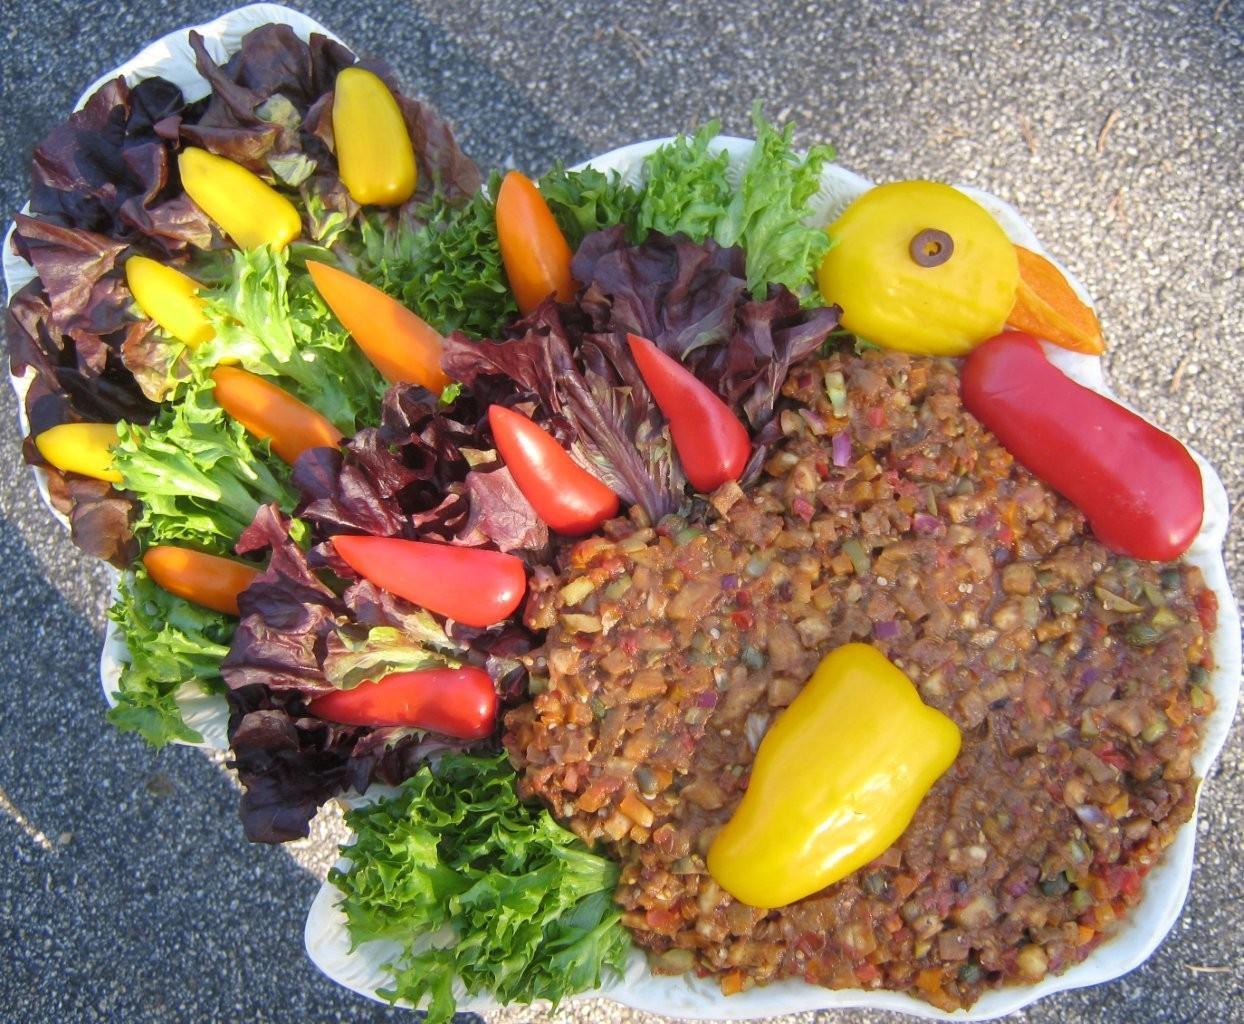 Vegan Turkey For Thanksgiving  the happy raw kitchen Raw Vegan Thanksgiving